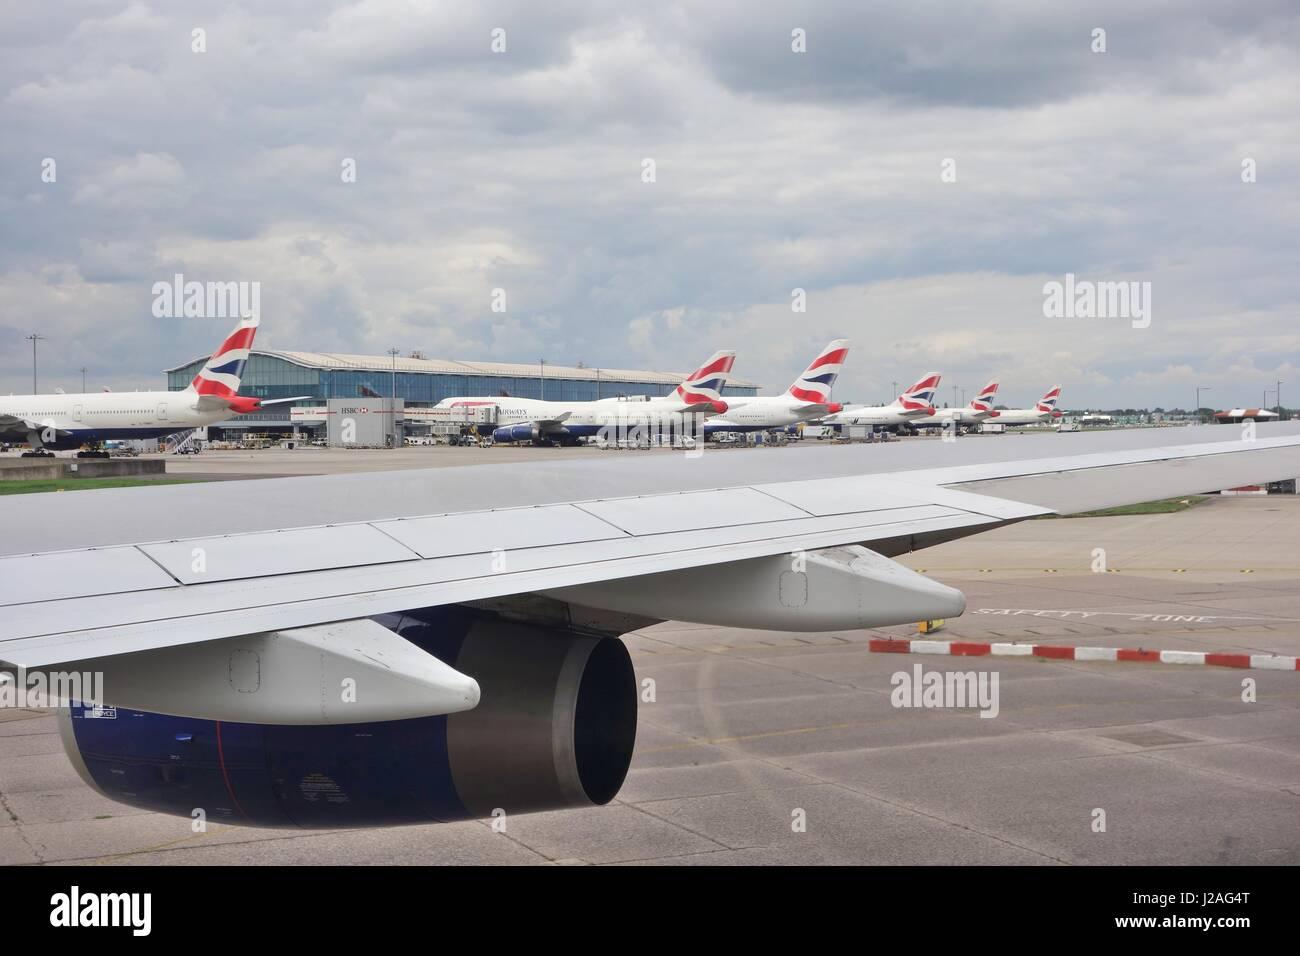 A row of British Airways aircraft sitting at Heathrow airport, England, UK - Stock Image